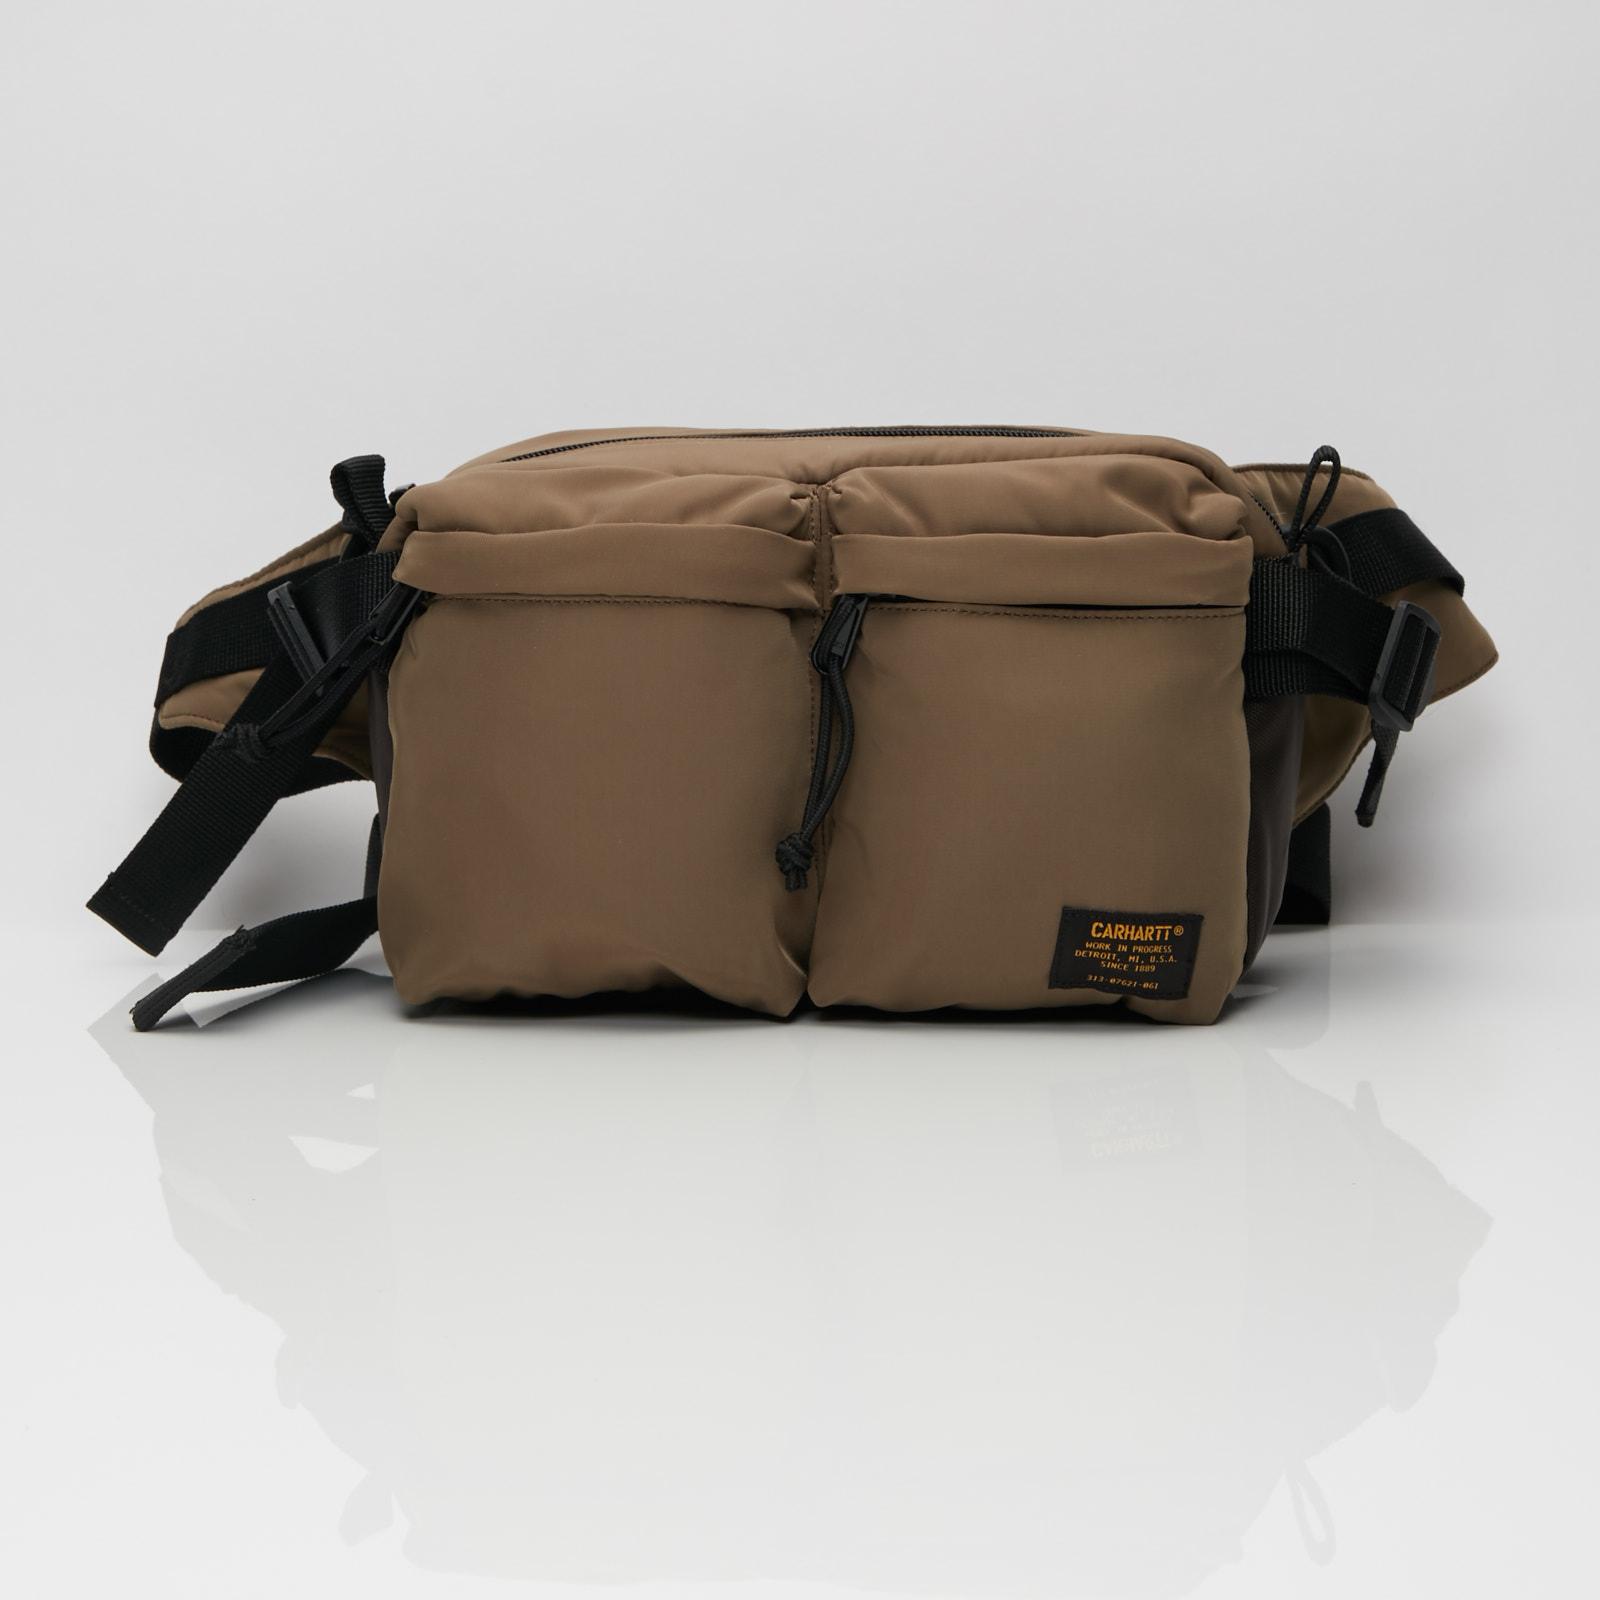 7fde682482 Carhartt WIP Military Hip Bag - I024252.968.90.06 - Sneakersnstuff ...